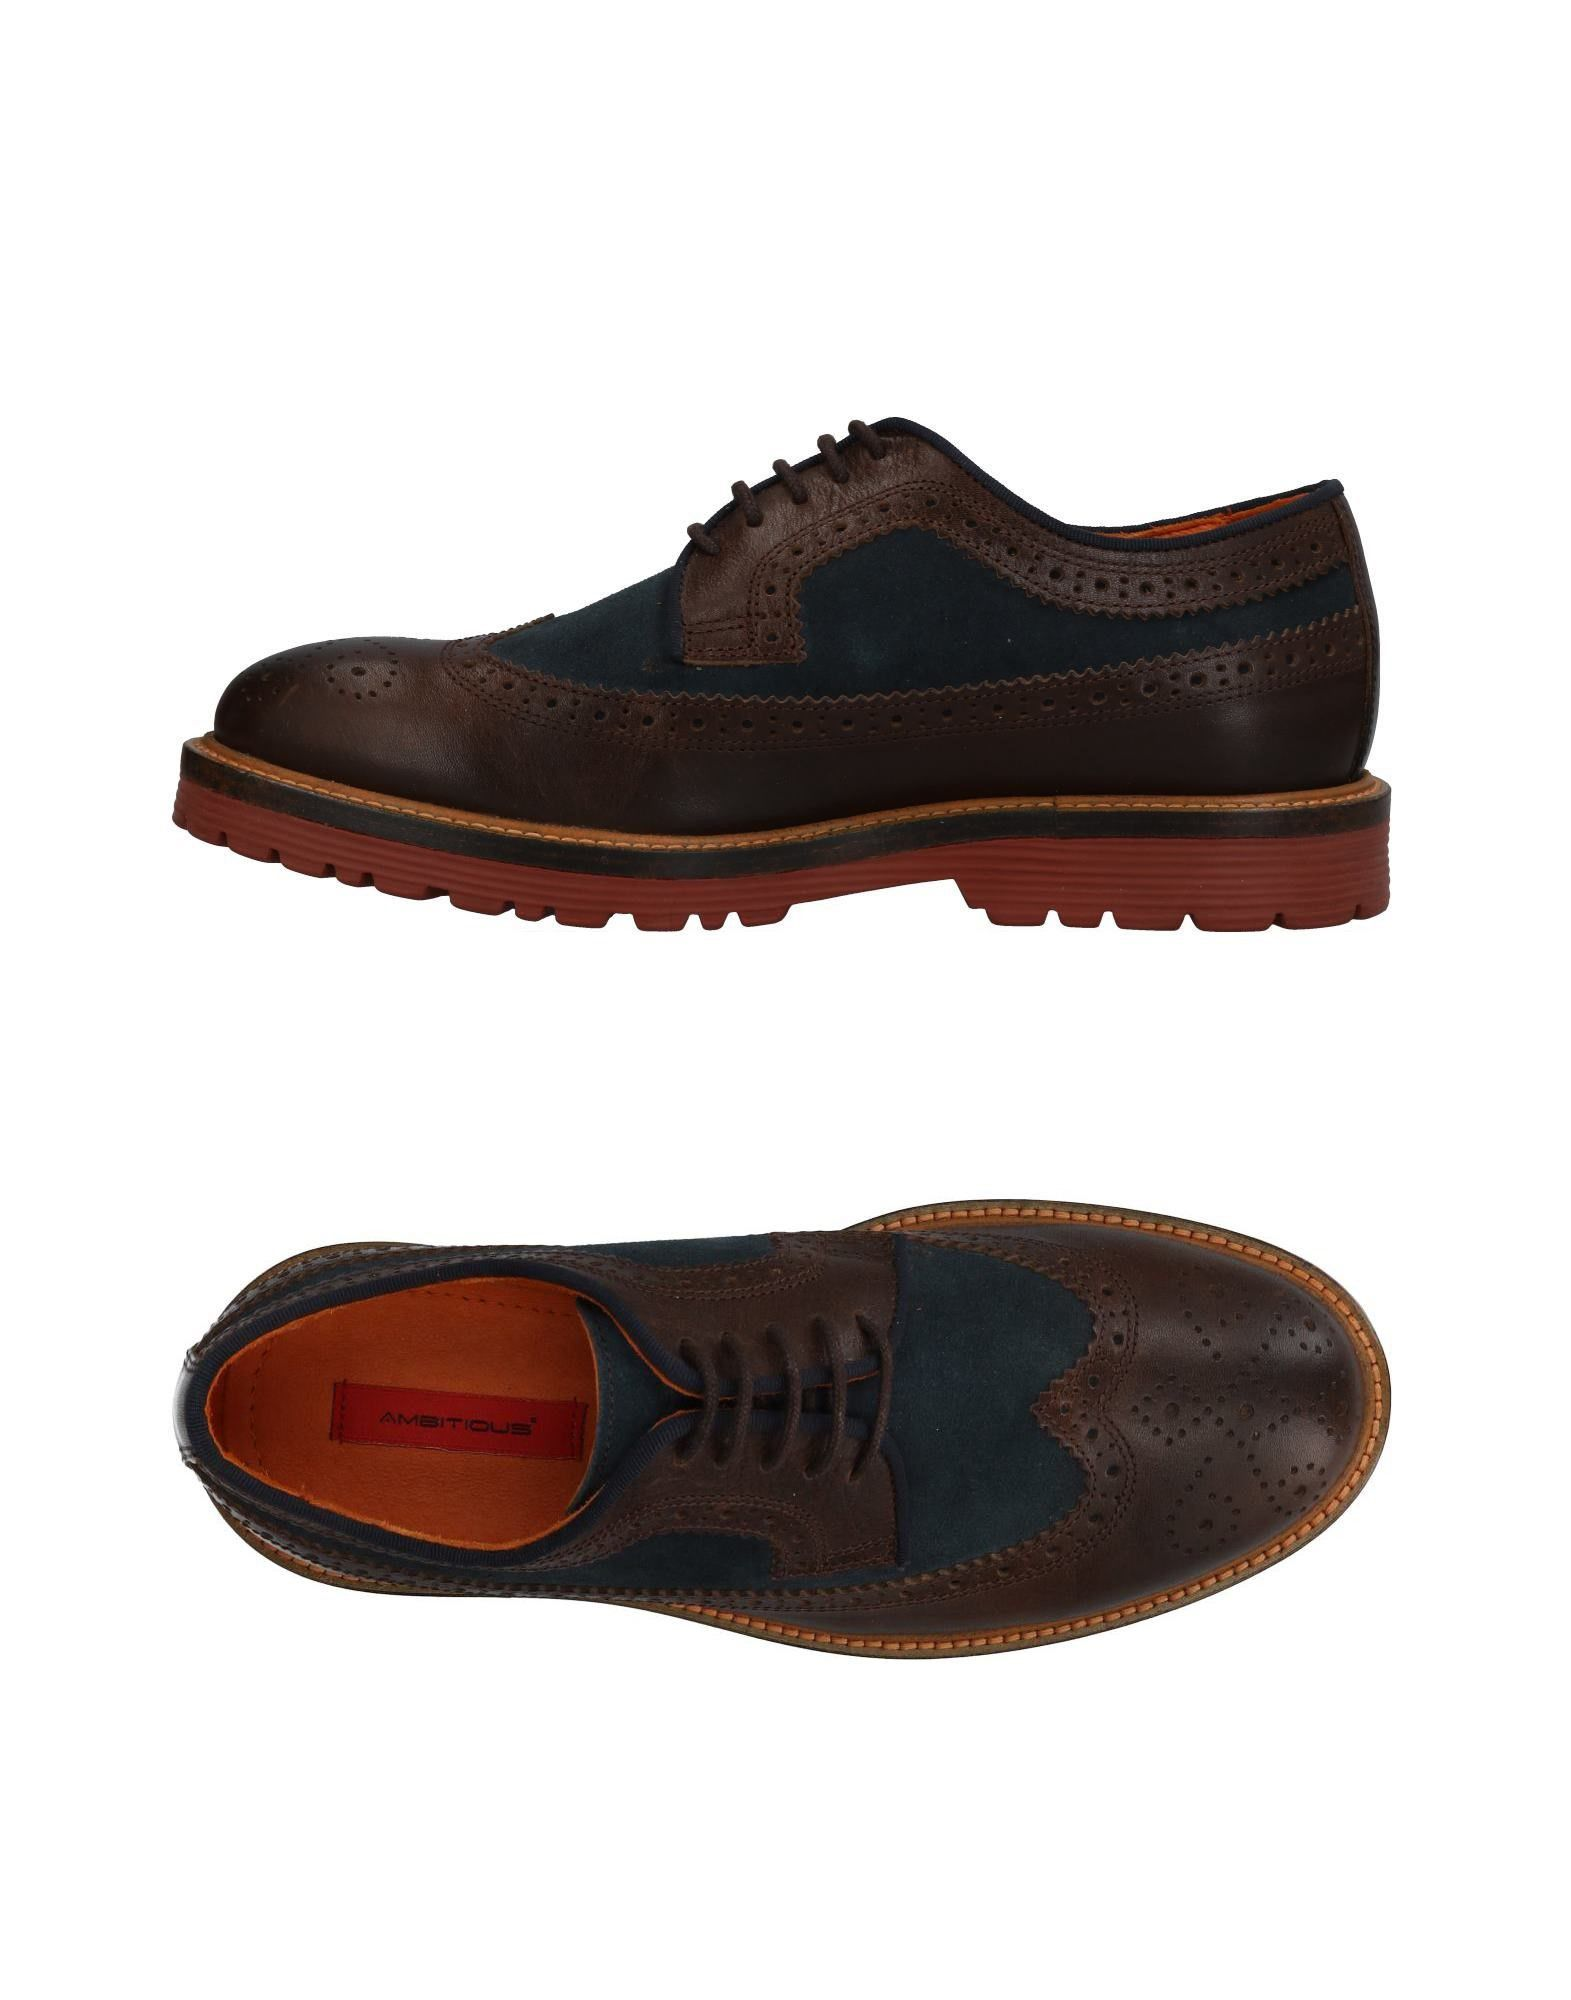 Rabatt echte  Schuhe Ambitious Schnürschuhe Herren  echte 11462525FV 7cba21